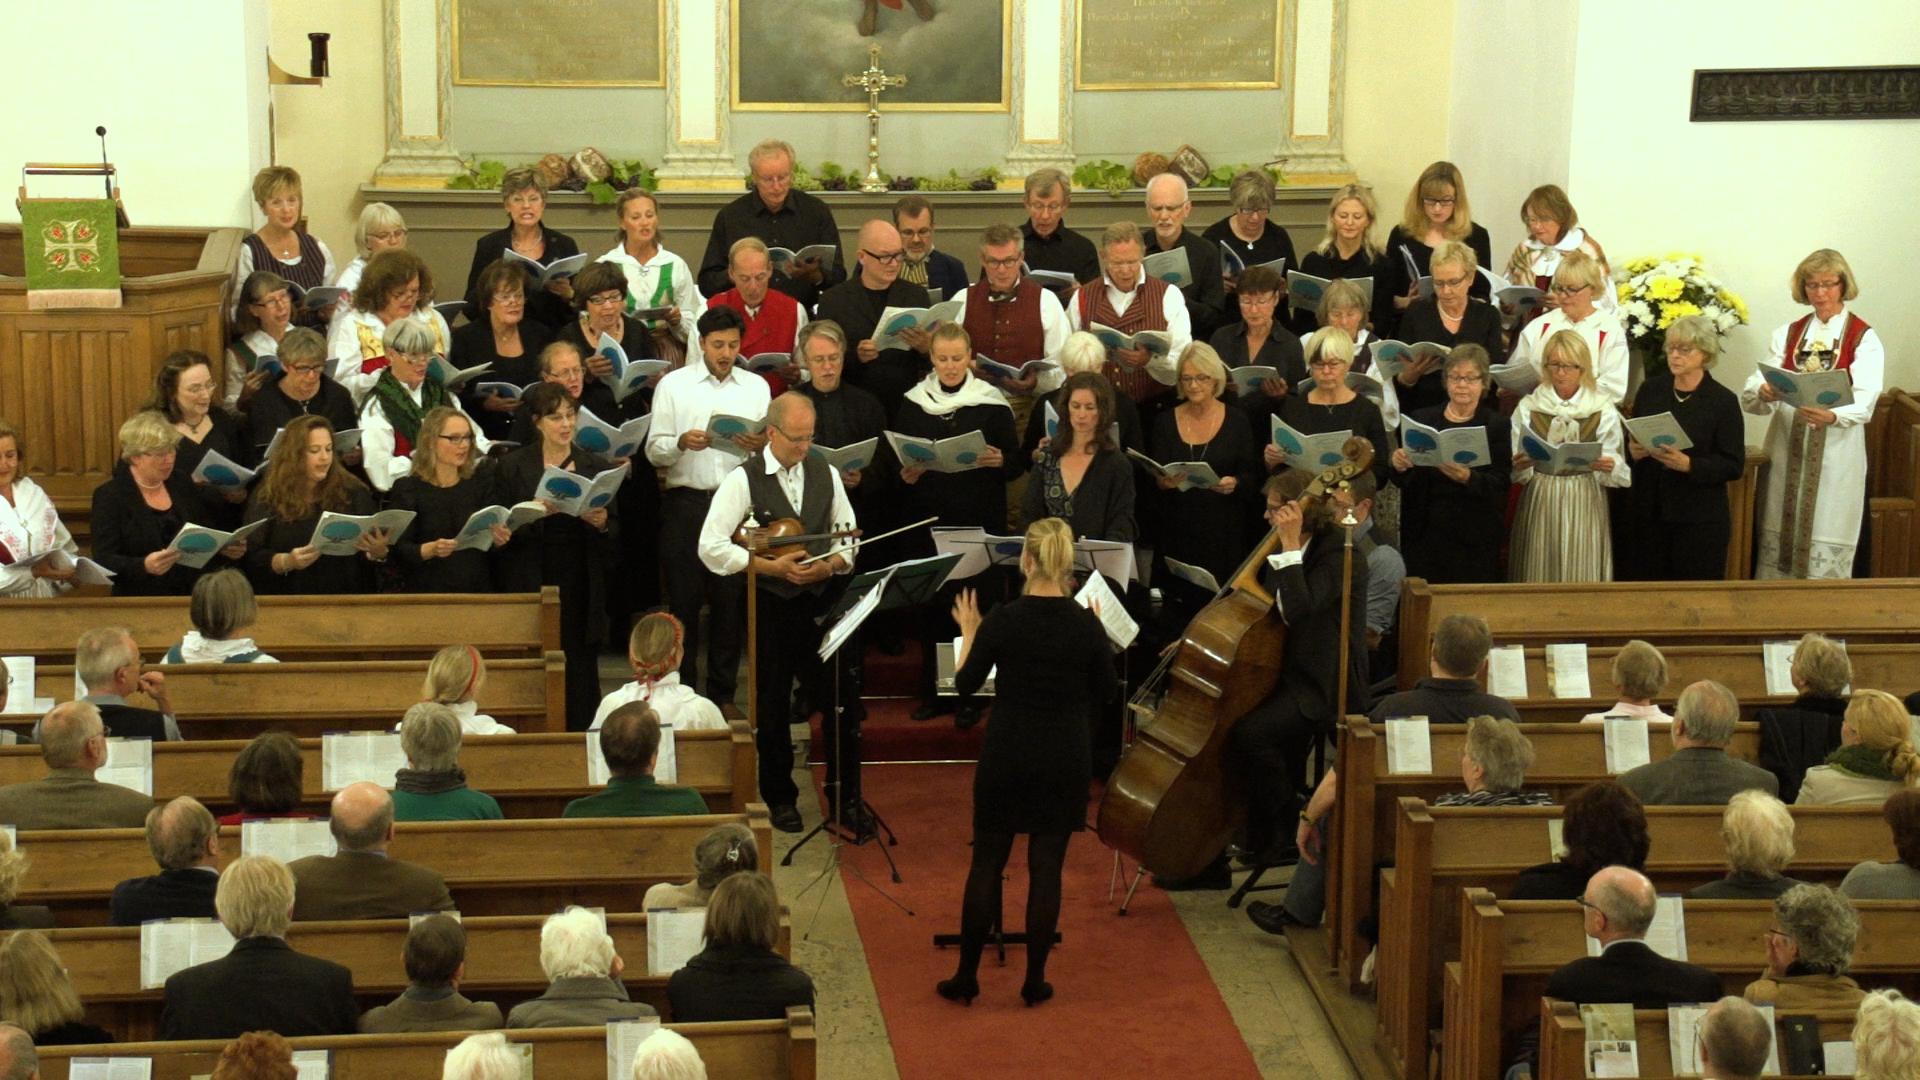 Himmelen inom (Heaven within) - A Swedish Folk Mass